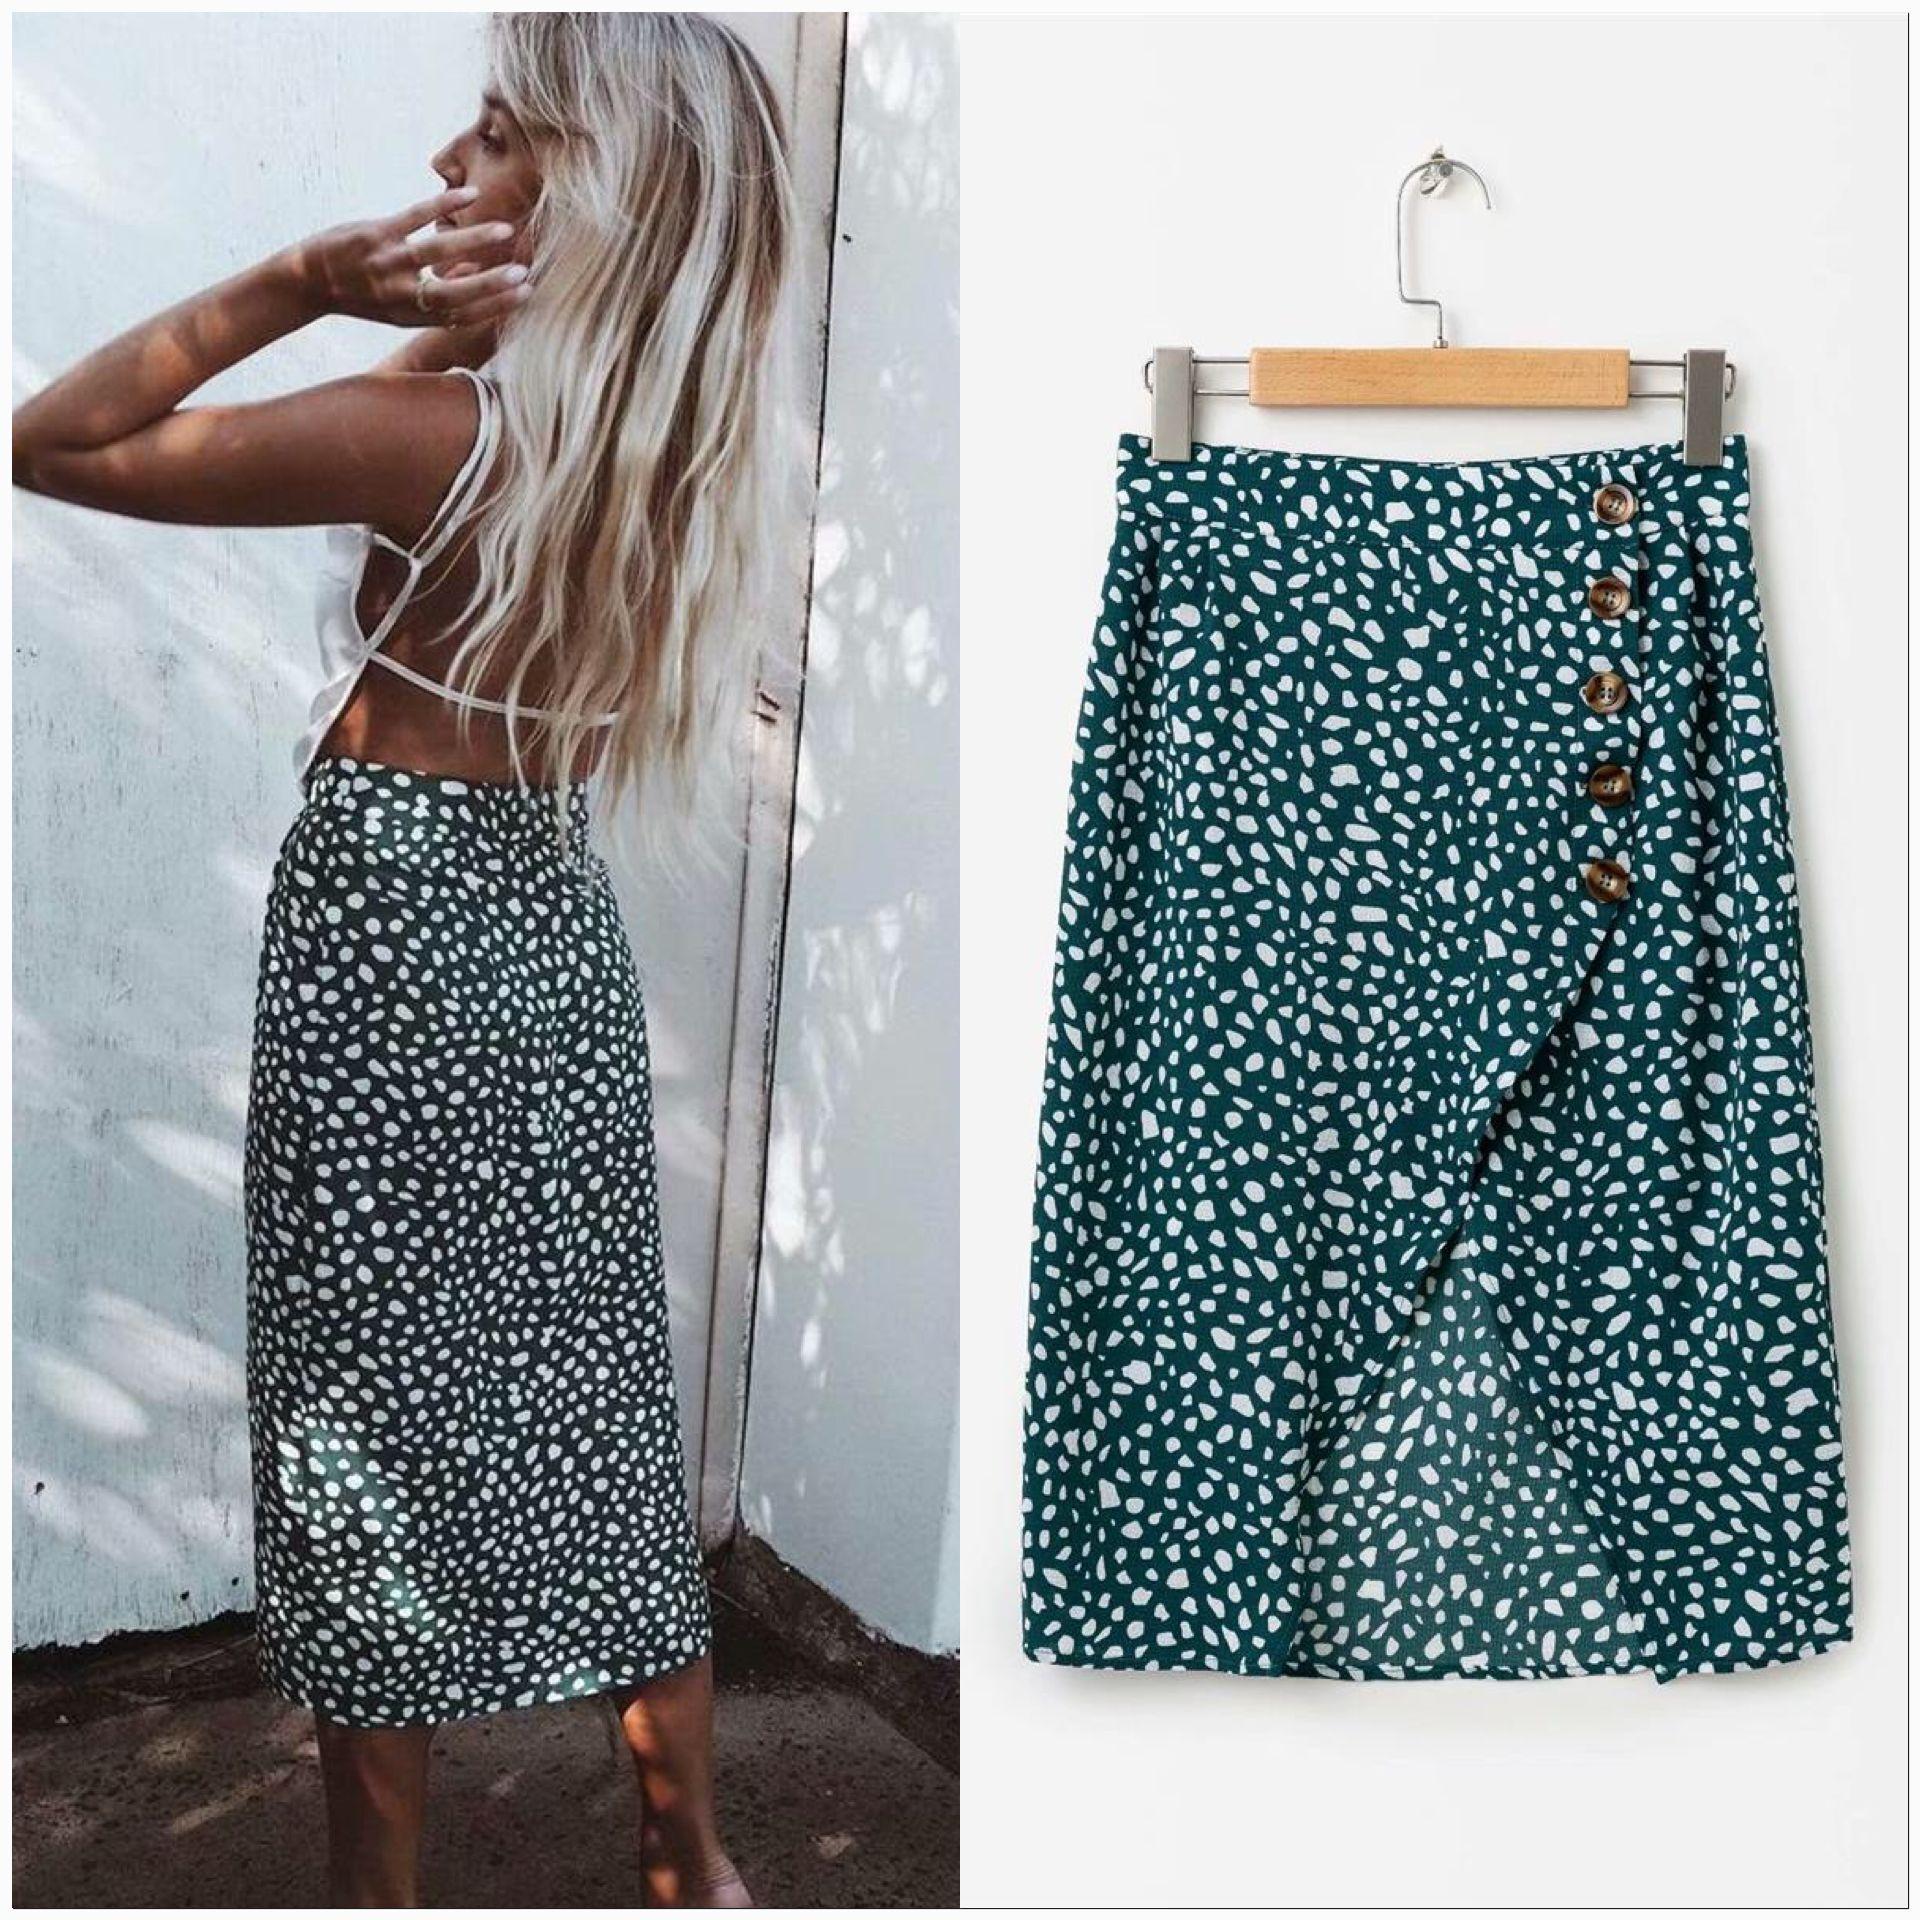 Cross border popular womens quick sell skirt womens sexy side slit printed beach skirt 039-c291